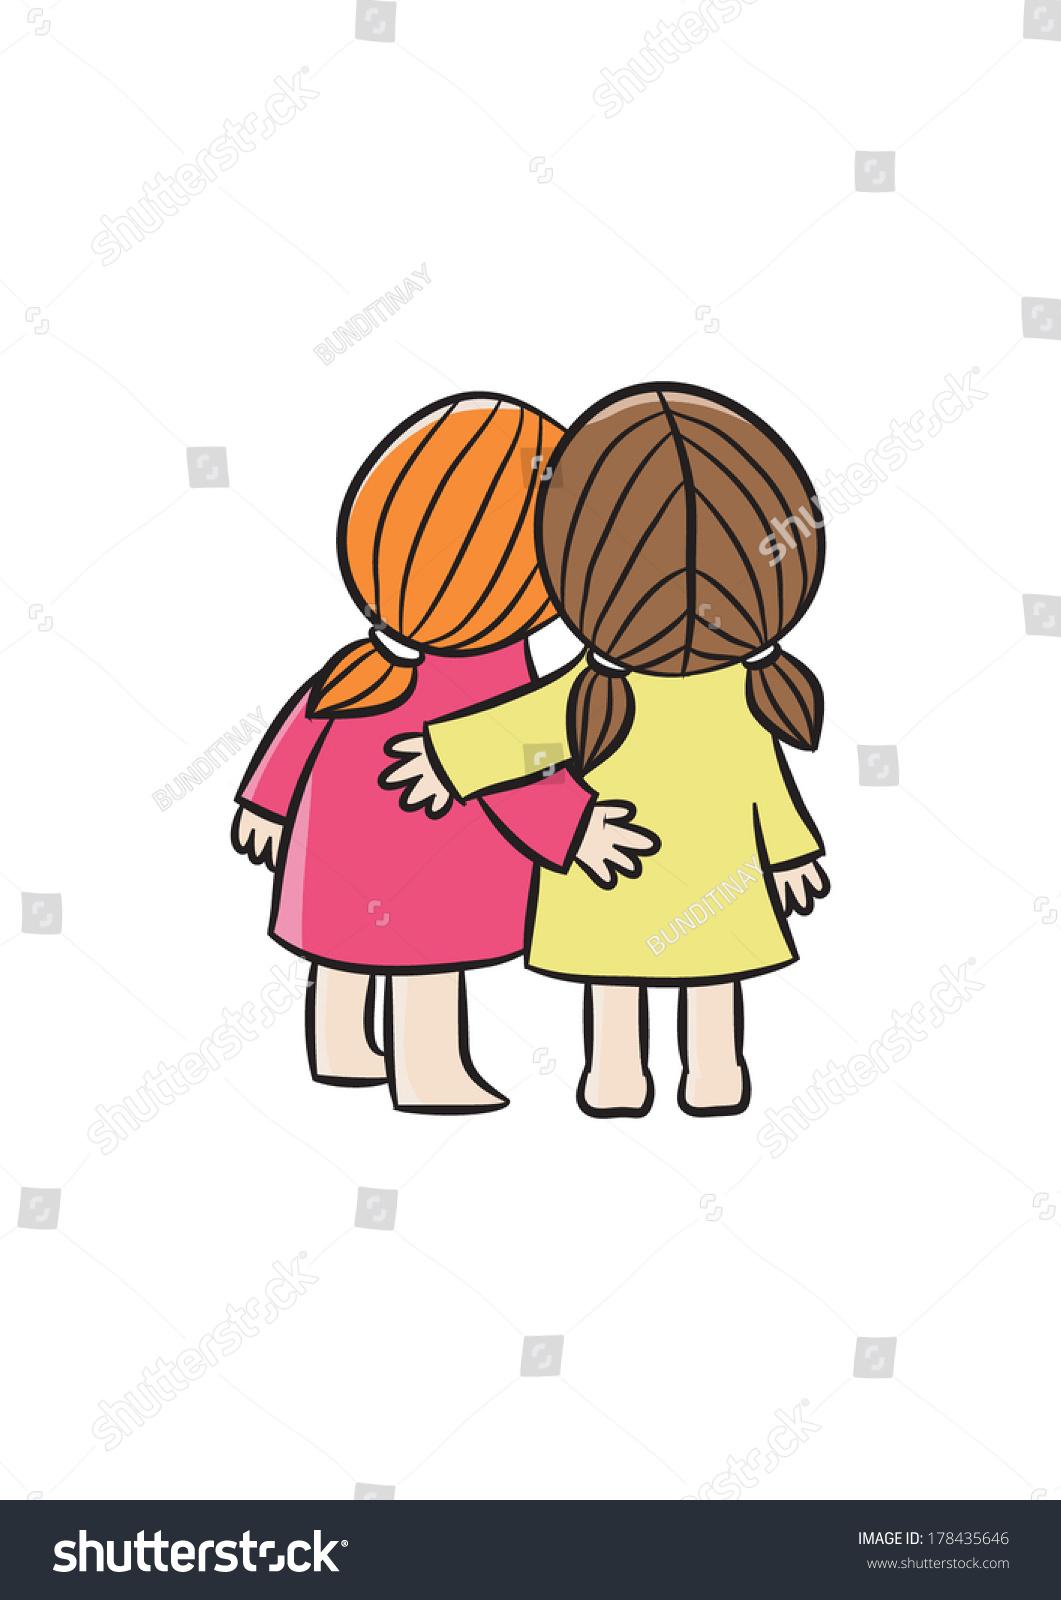 Details about Best Friends Cartoon Font  Unisex bffs